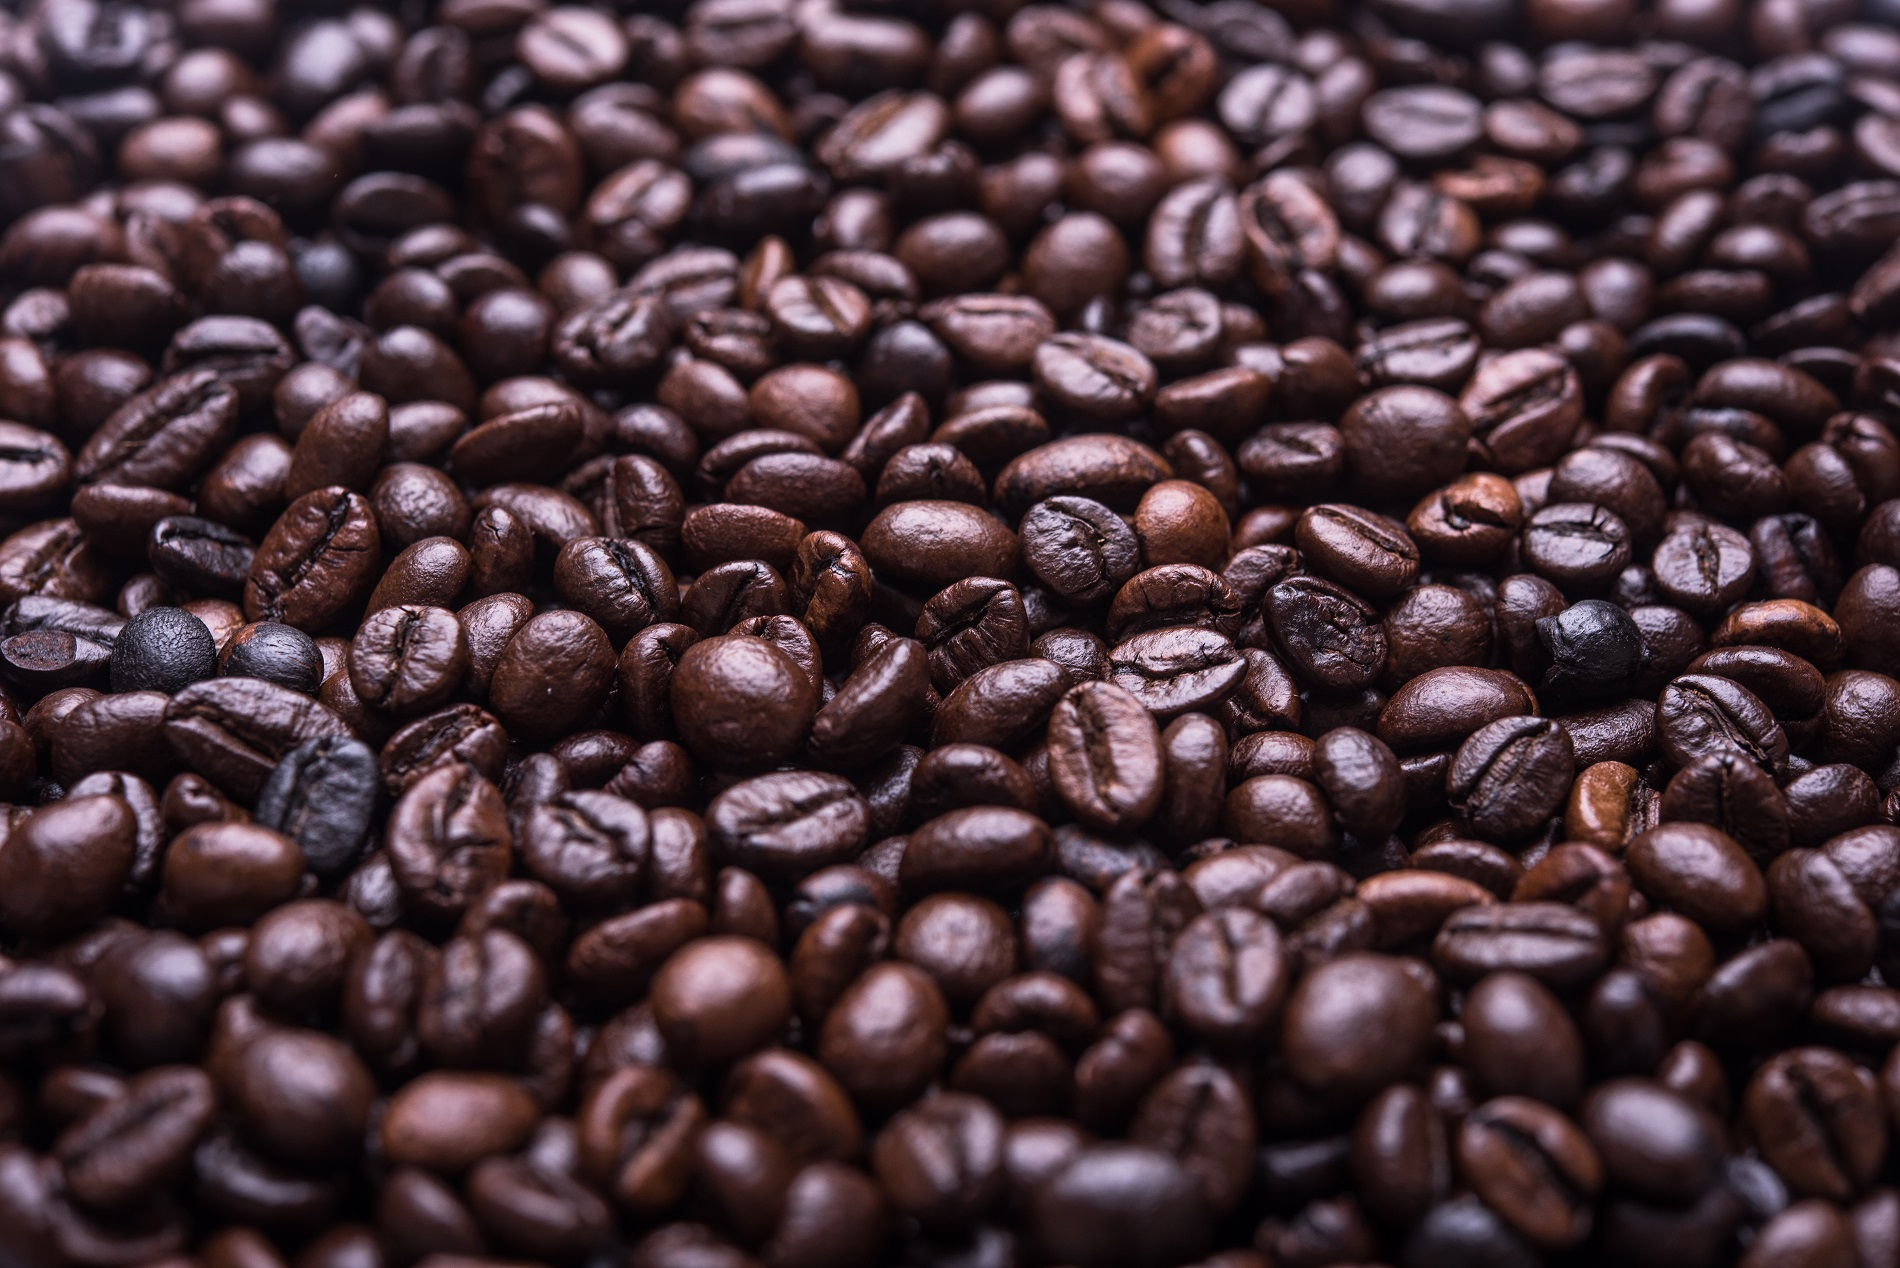 Crop Damage Gives Coffee ETNs a Jolt